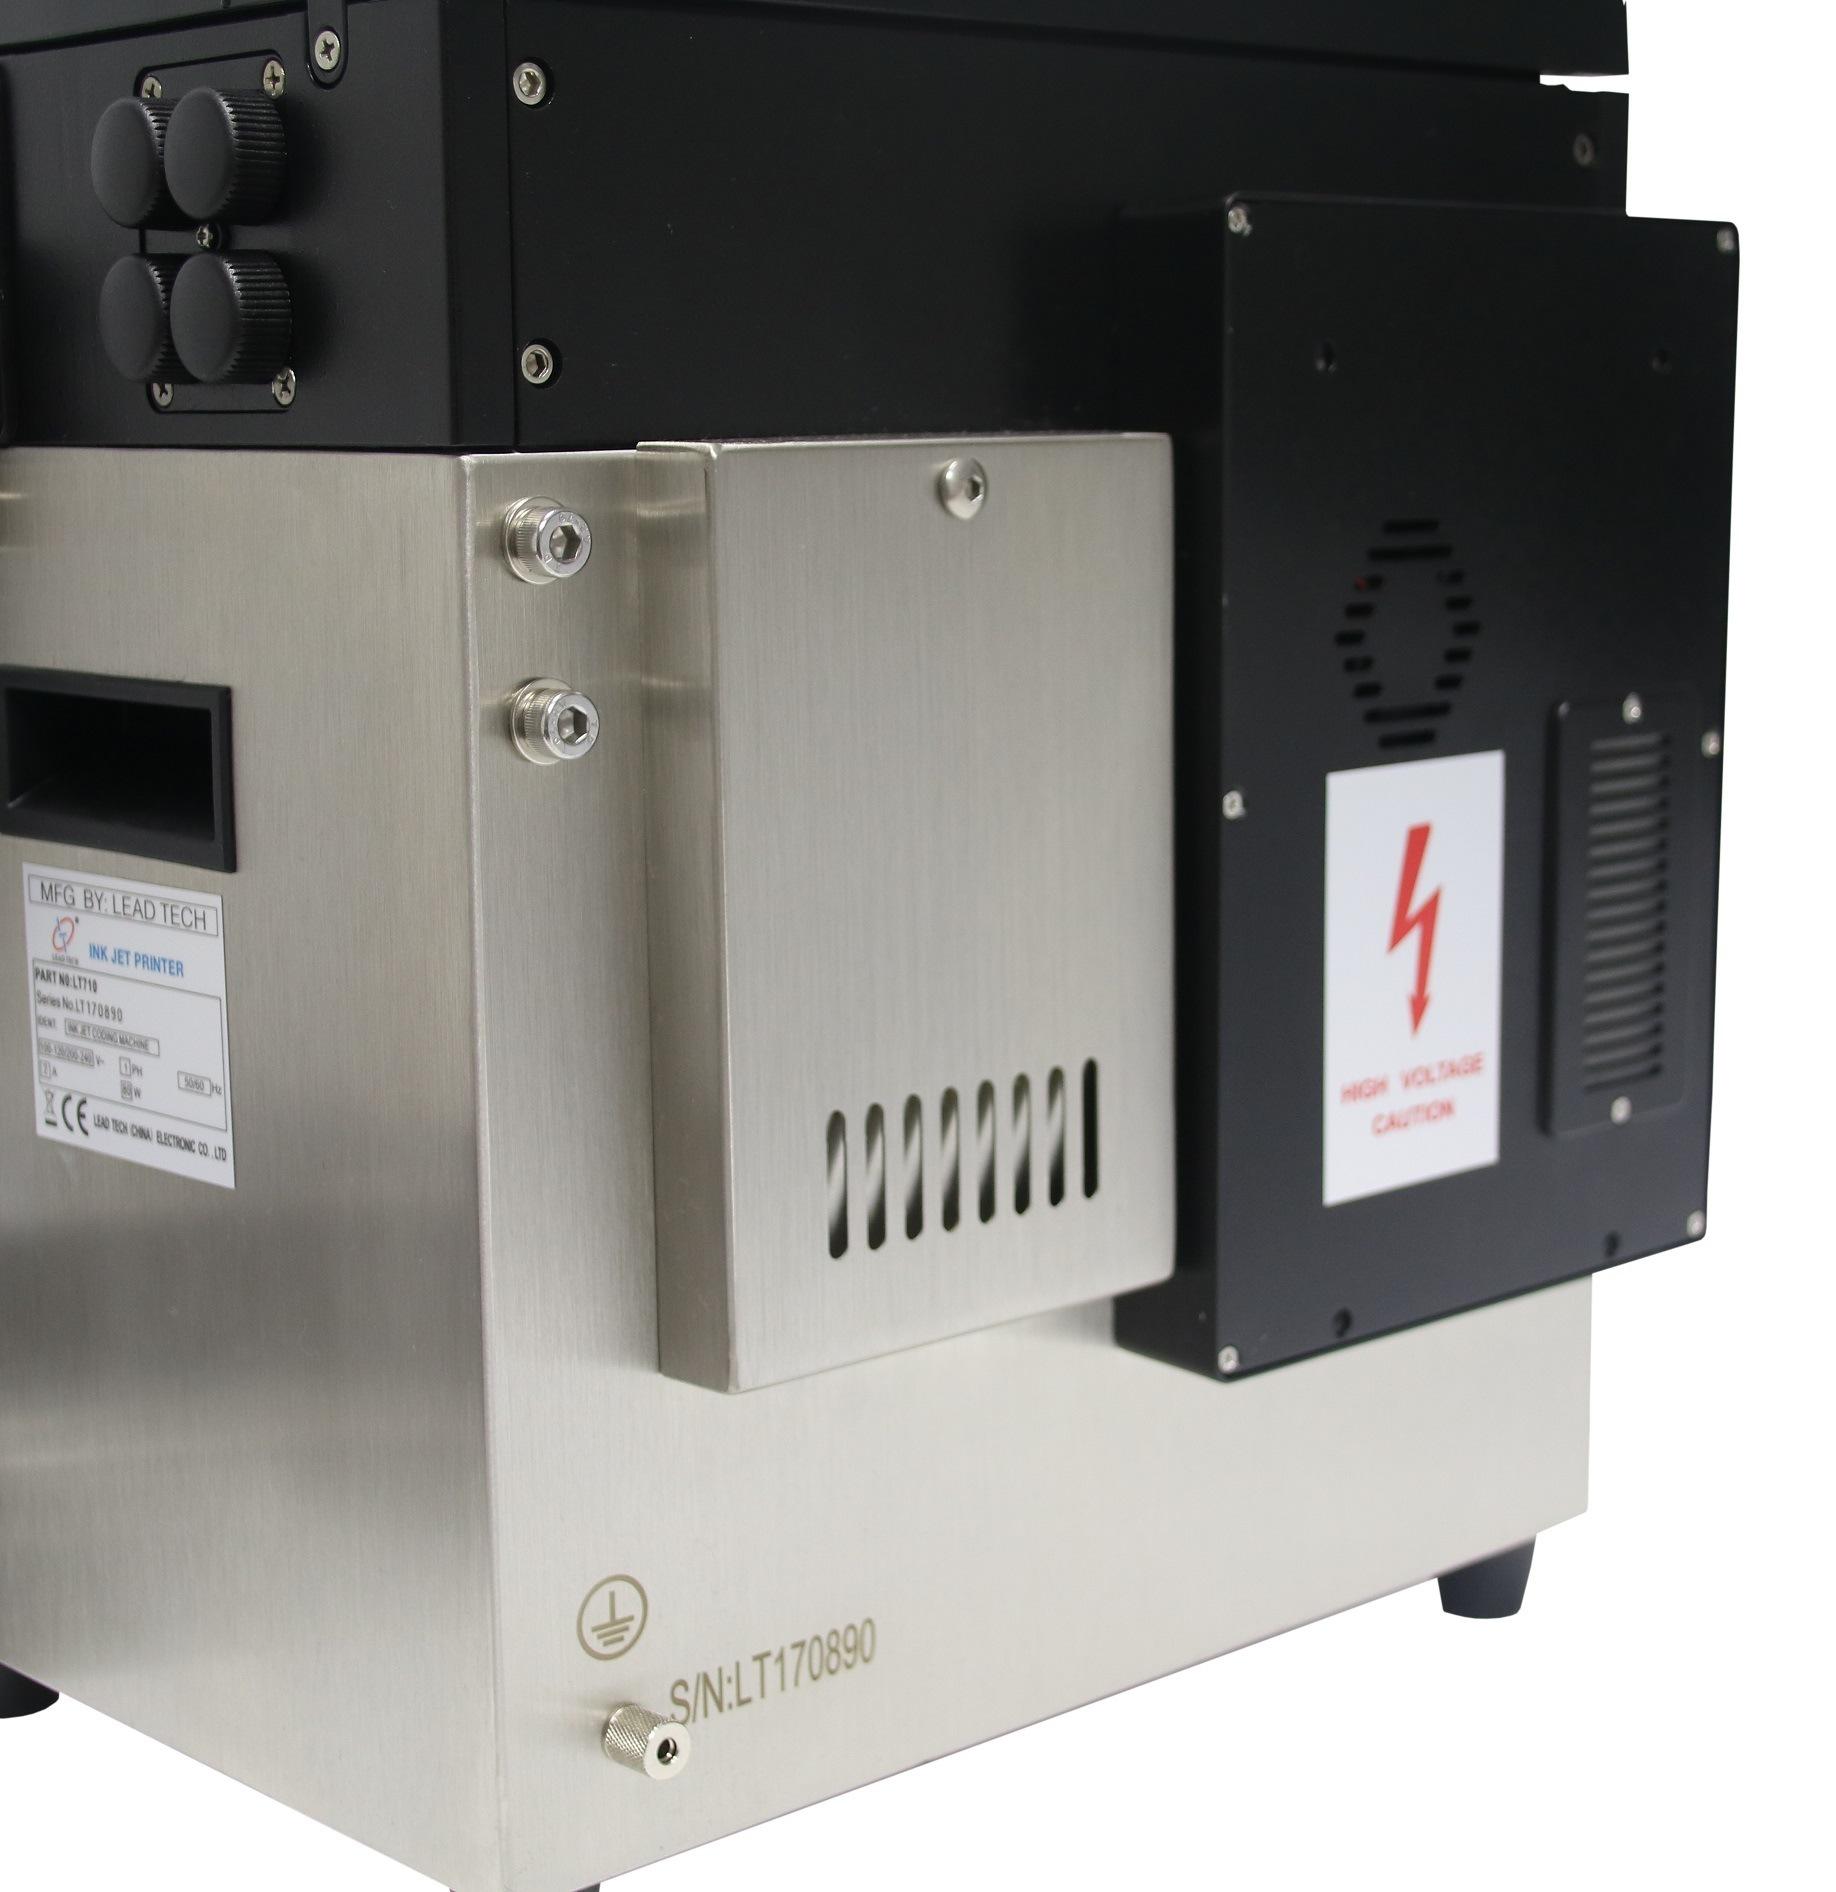 Lead Tech Lt760 Continuous Reverse Printing Inkjet Printer